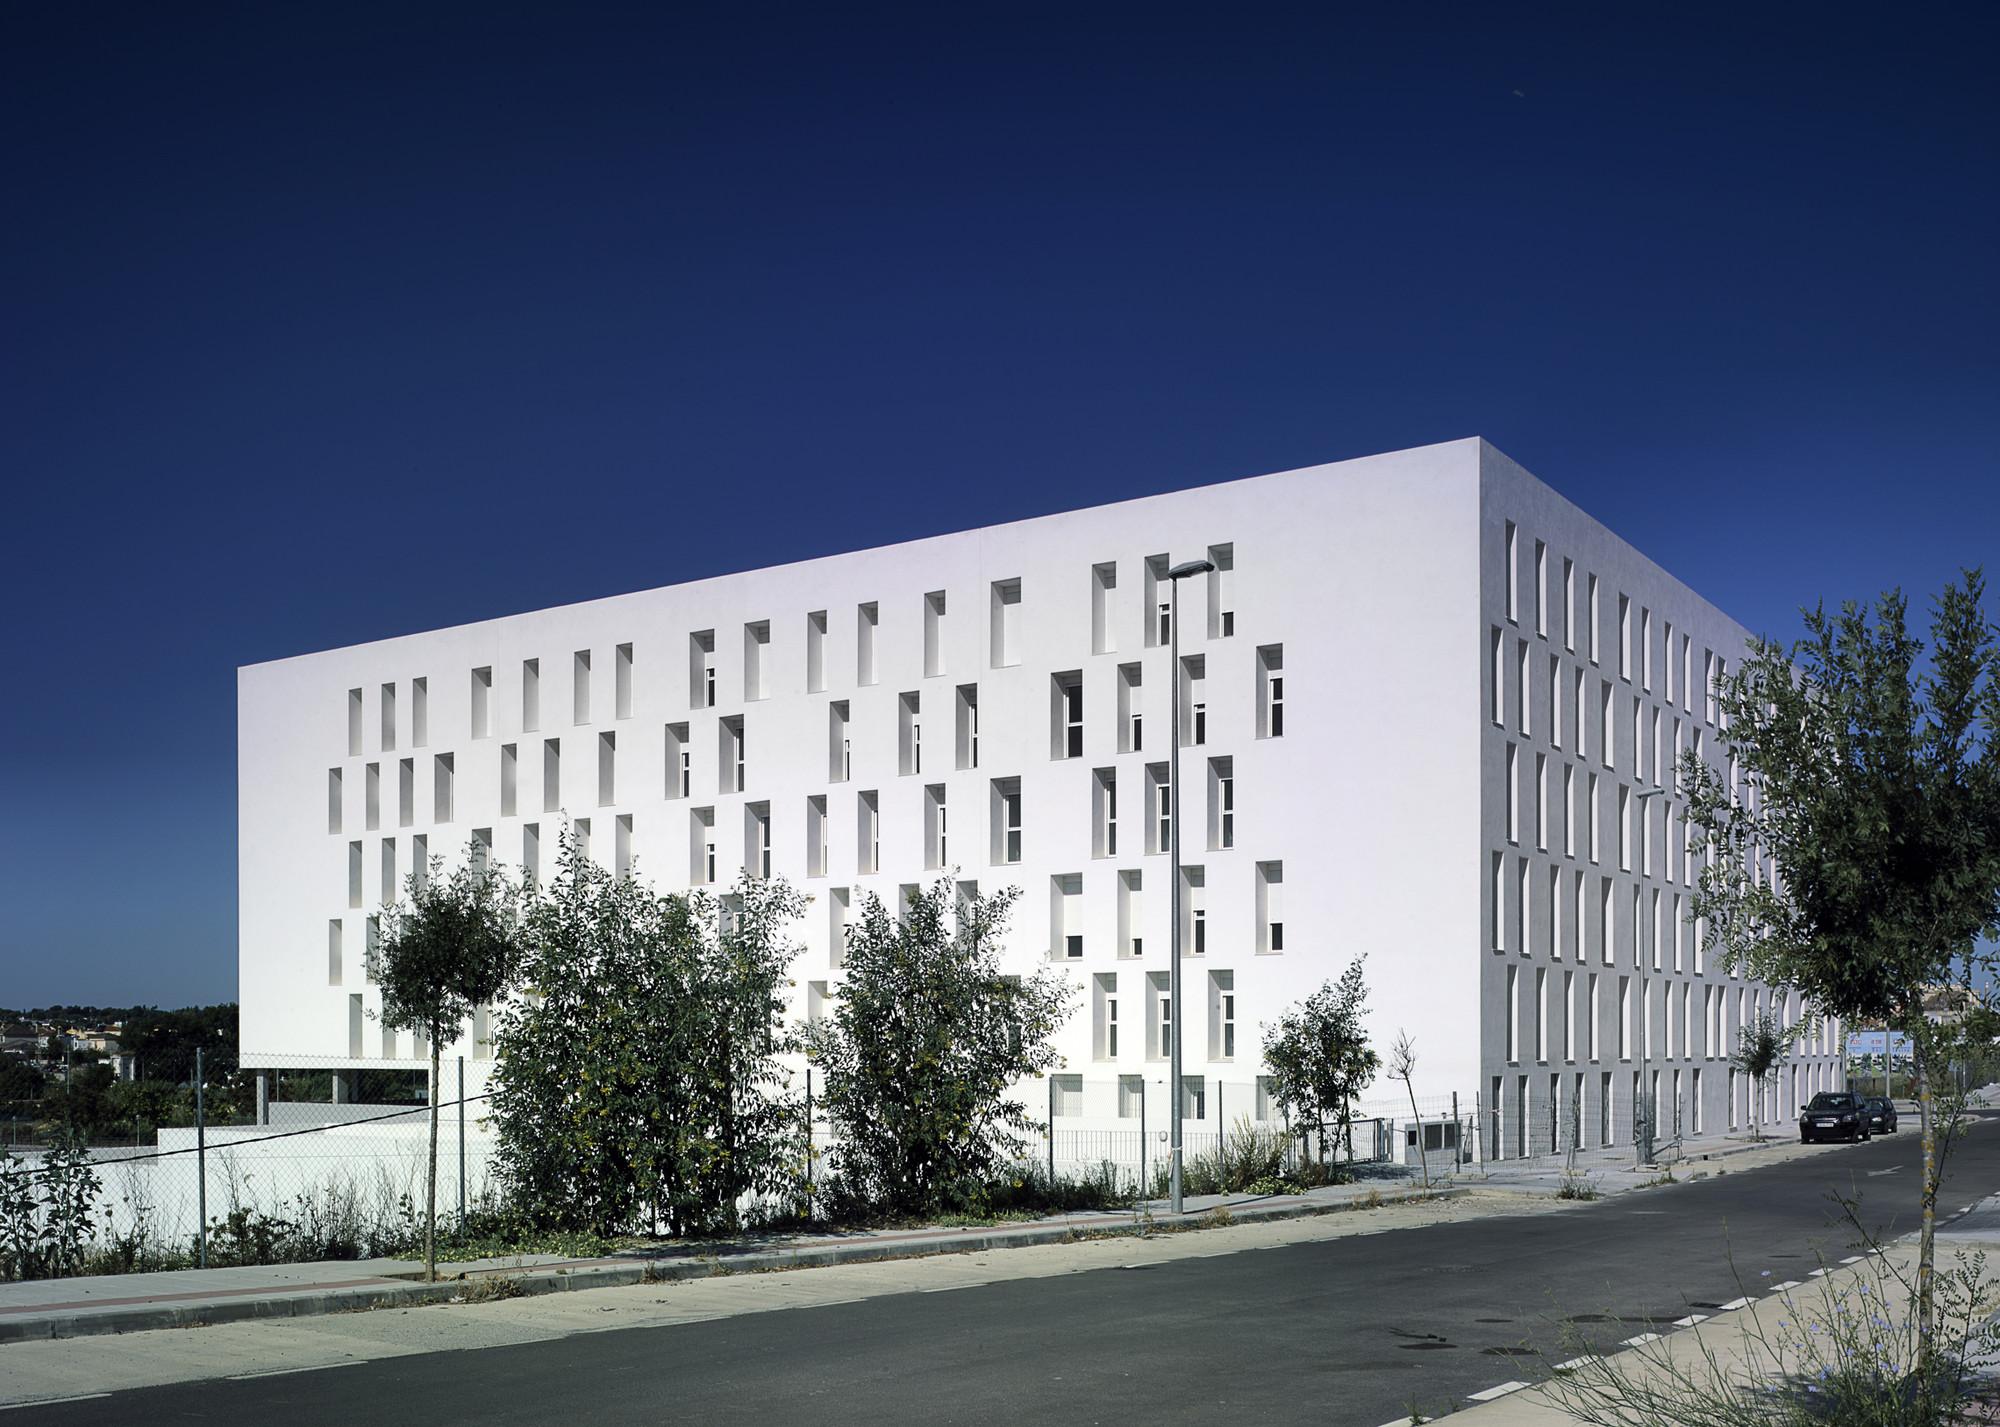 88 Jerez Dwellings / Daroca Arquitectos, © Jesus Granada